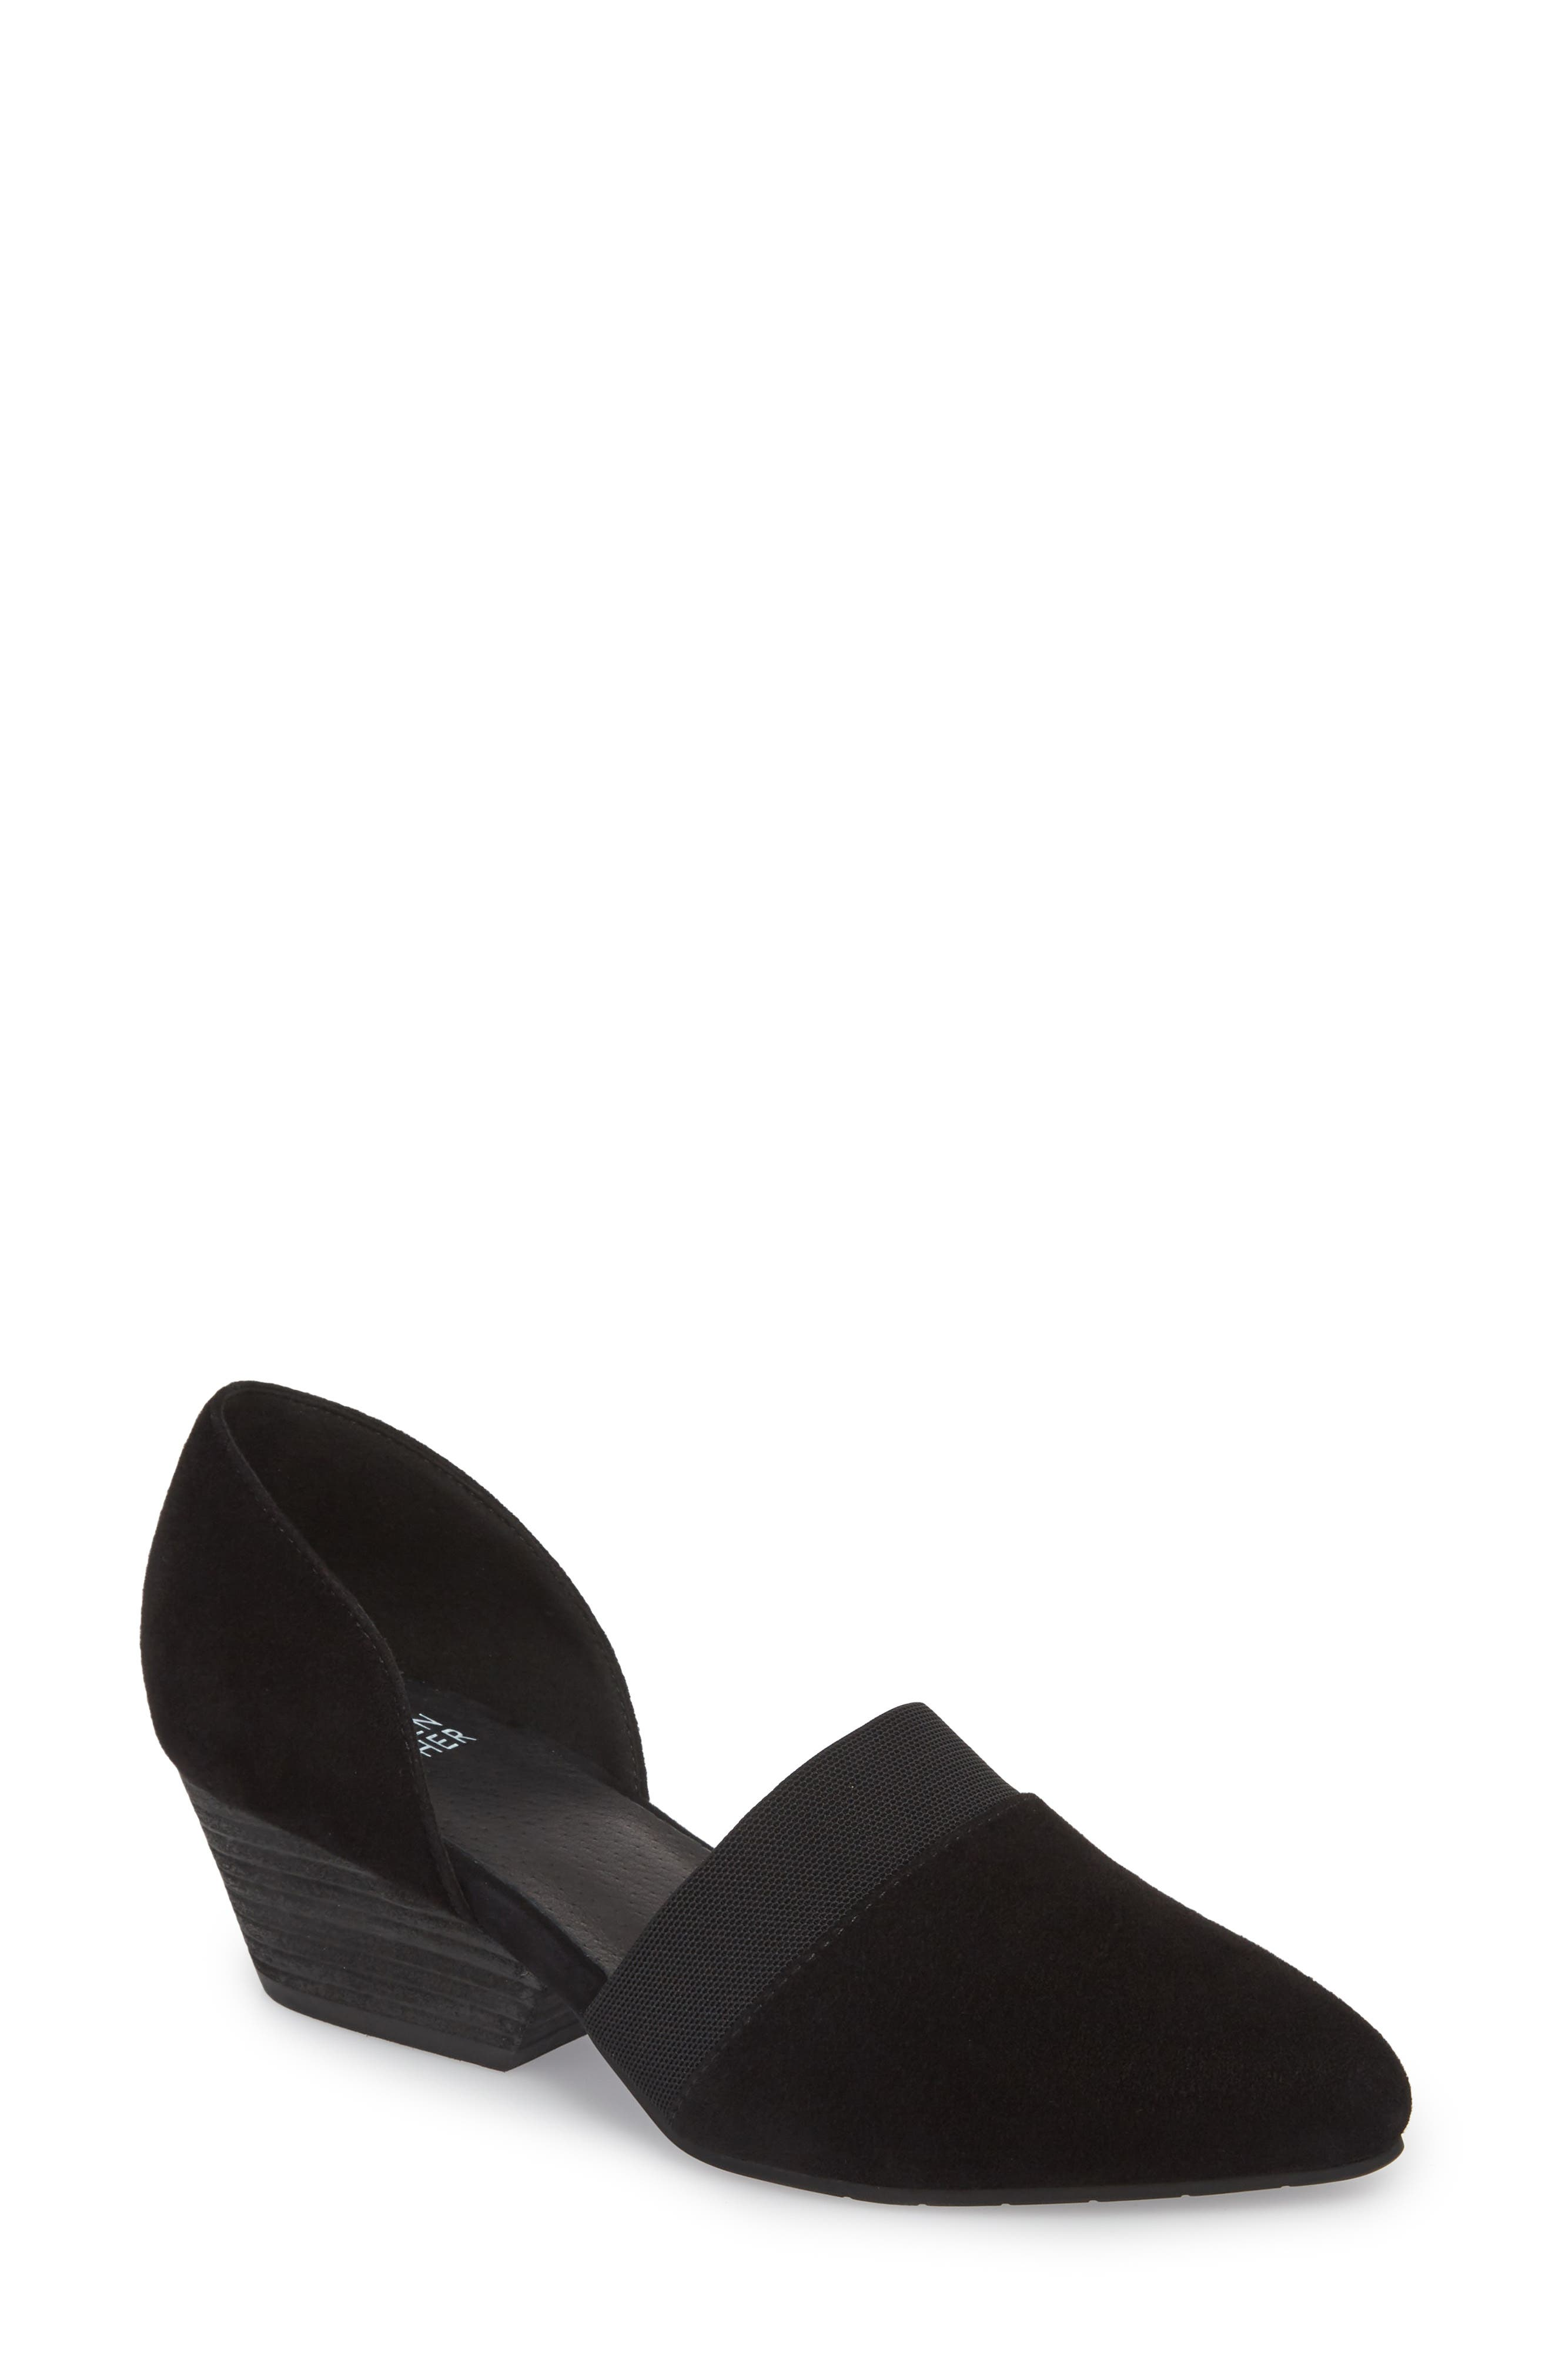 Women'S Hilly Suede D'Orsay Mid-Heel Pumps in Black Suede